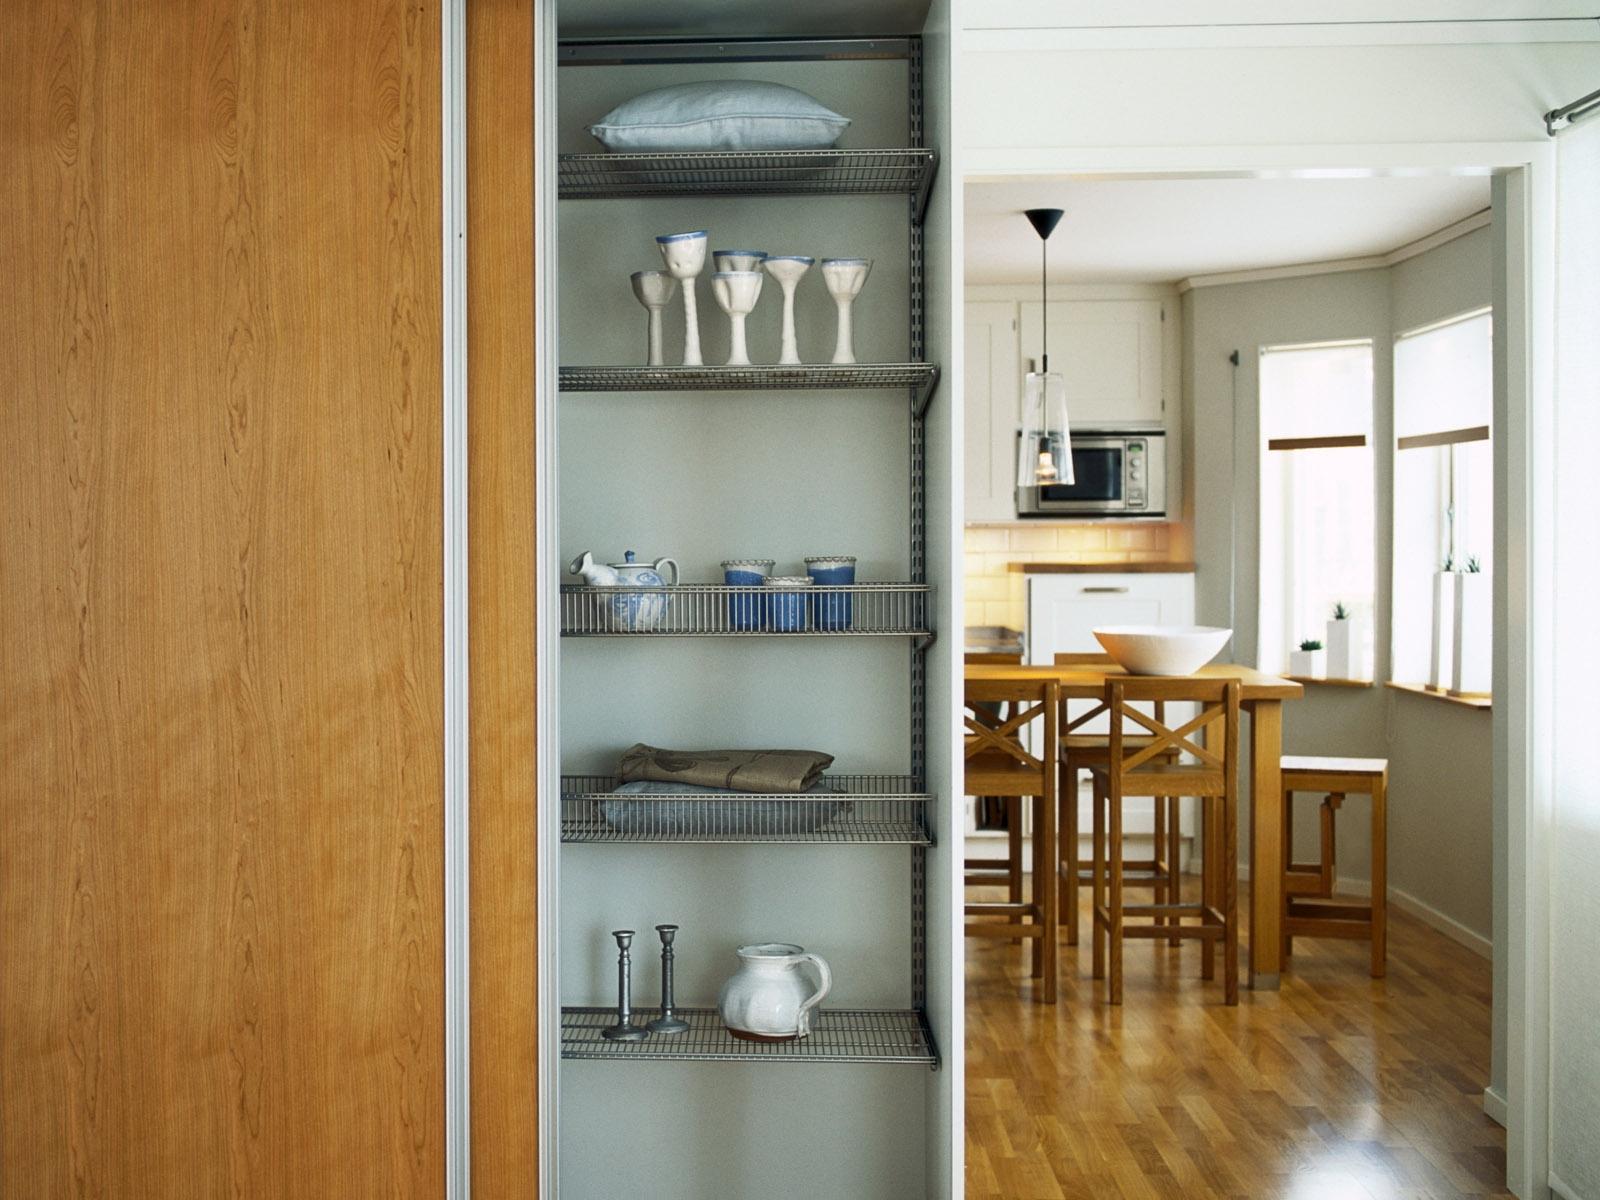 Fondos de pantalla : habitación, pared, mesa, cocina, diseño de ...